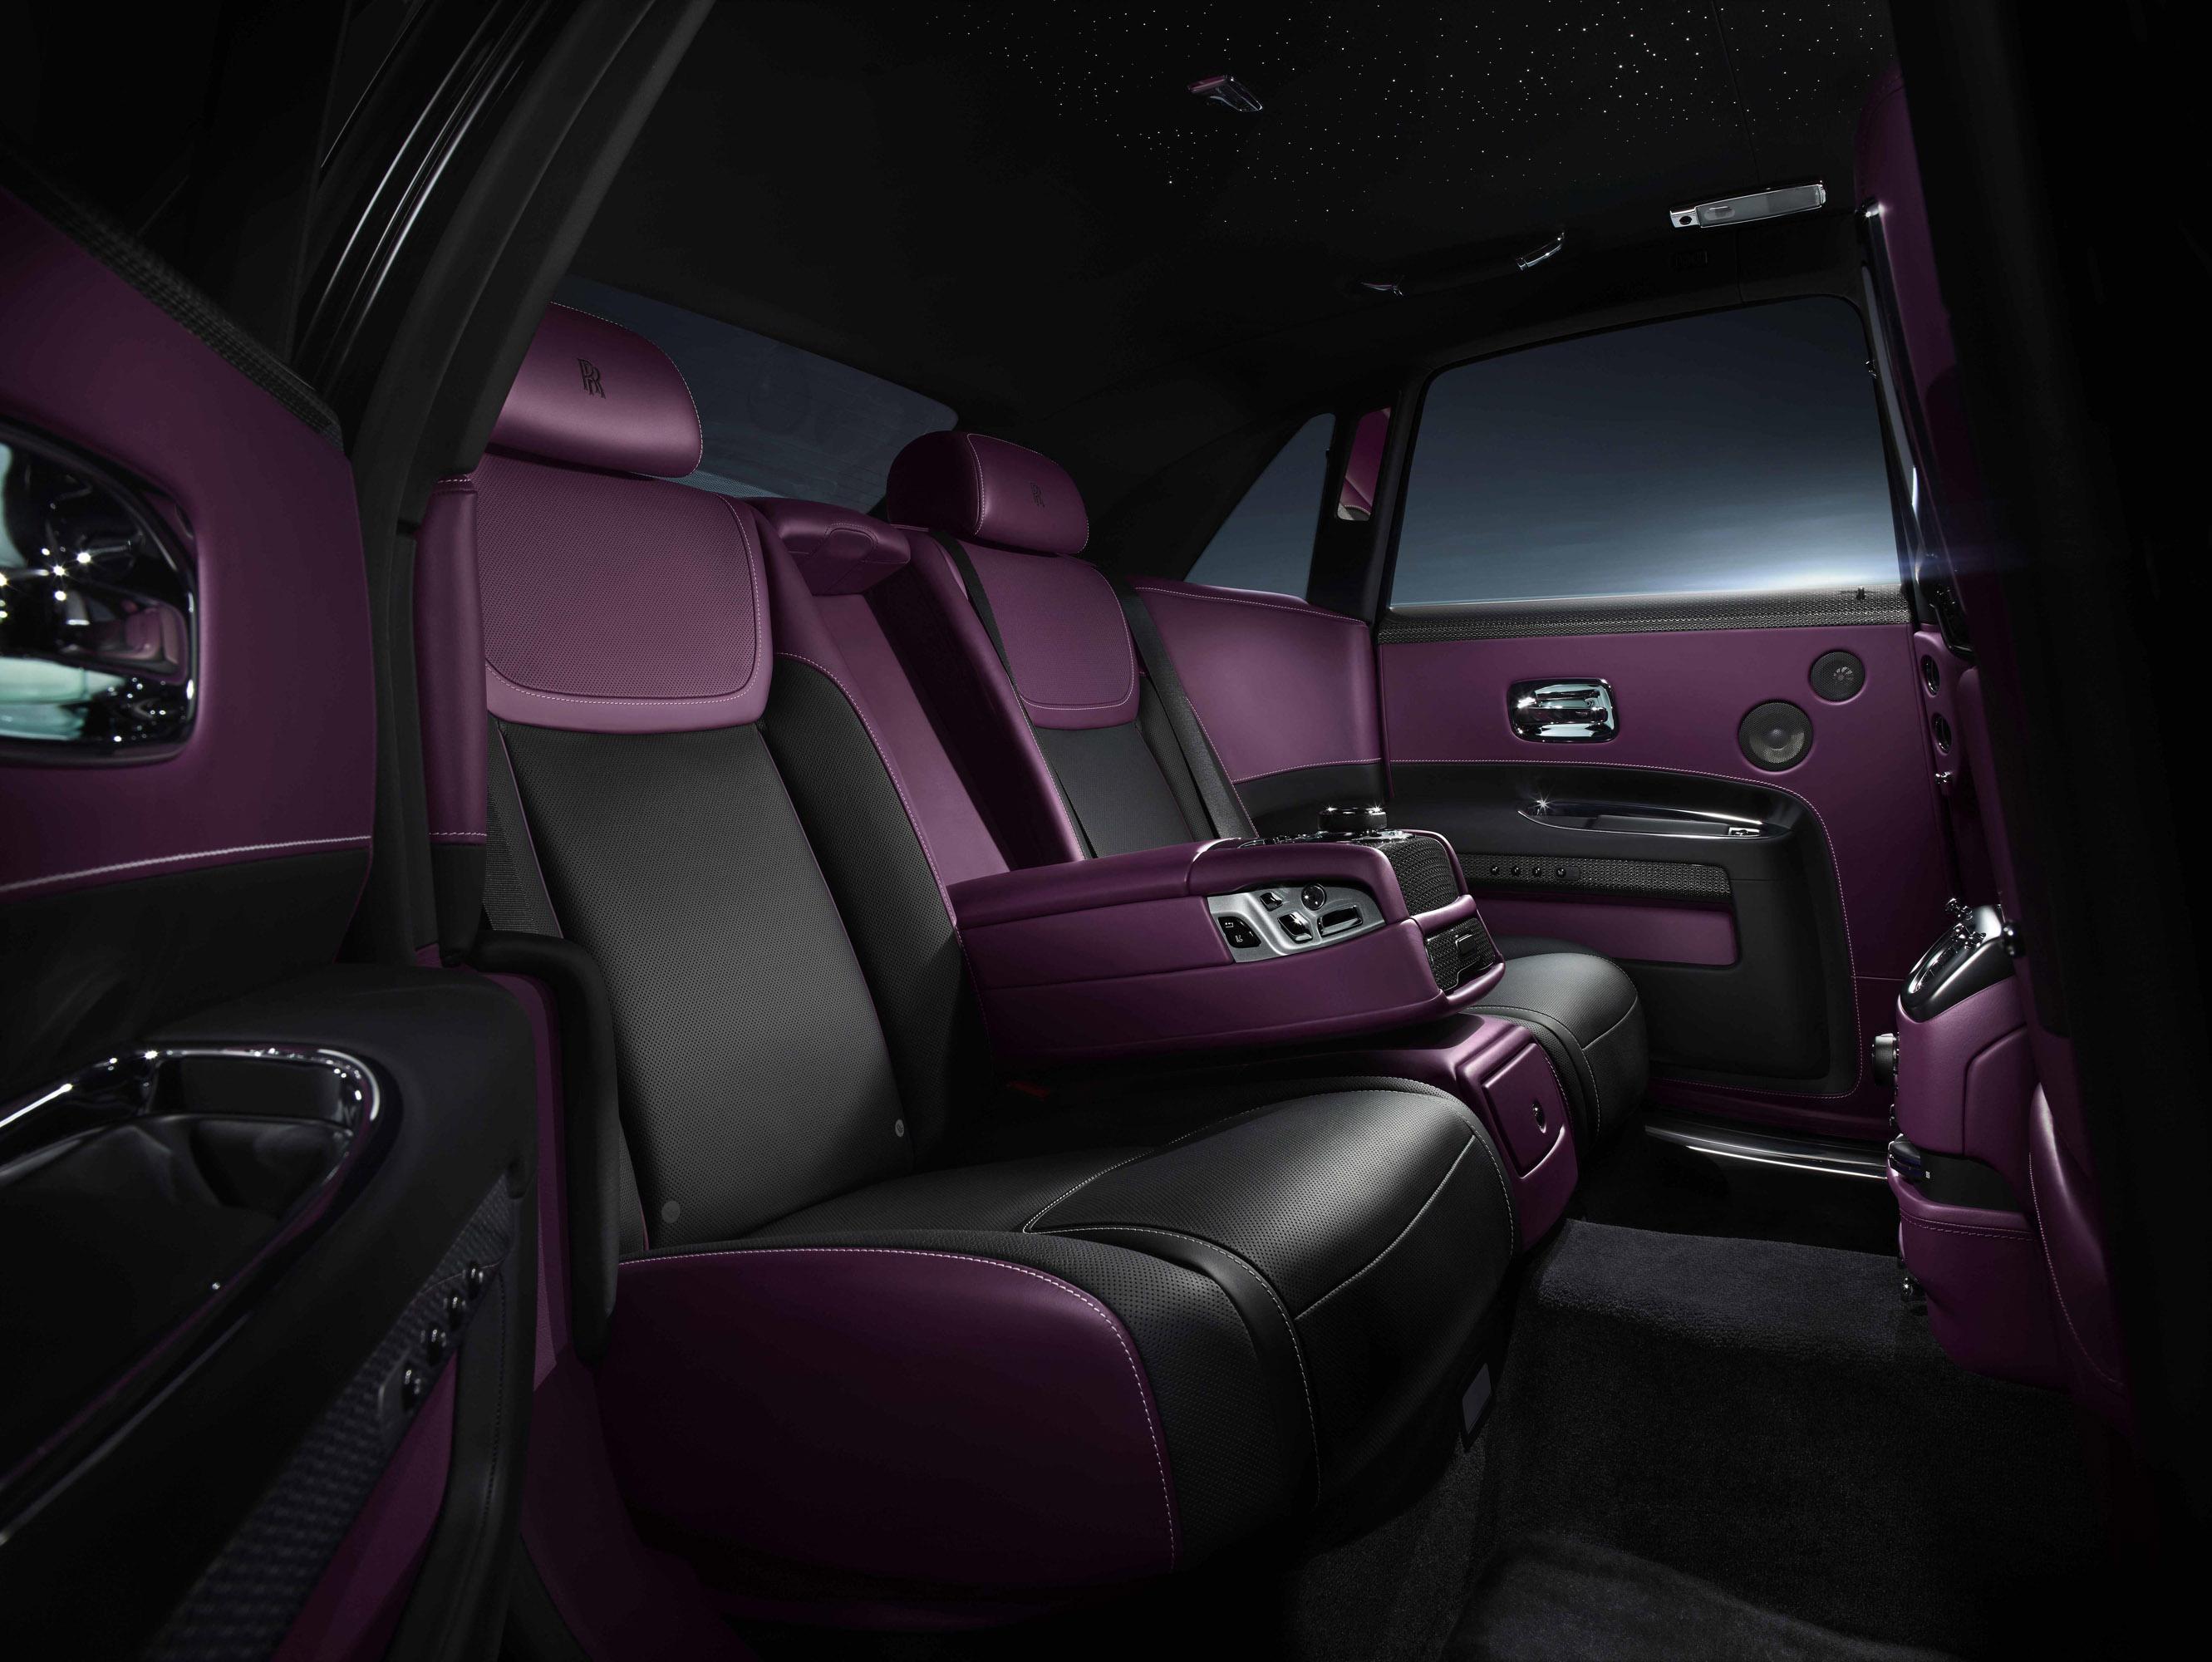 Rolls Royce Reveals Black Badge Edition